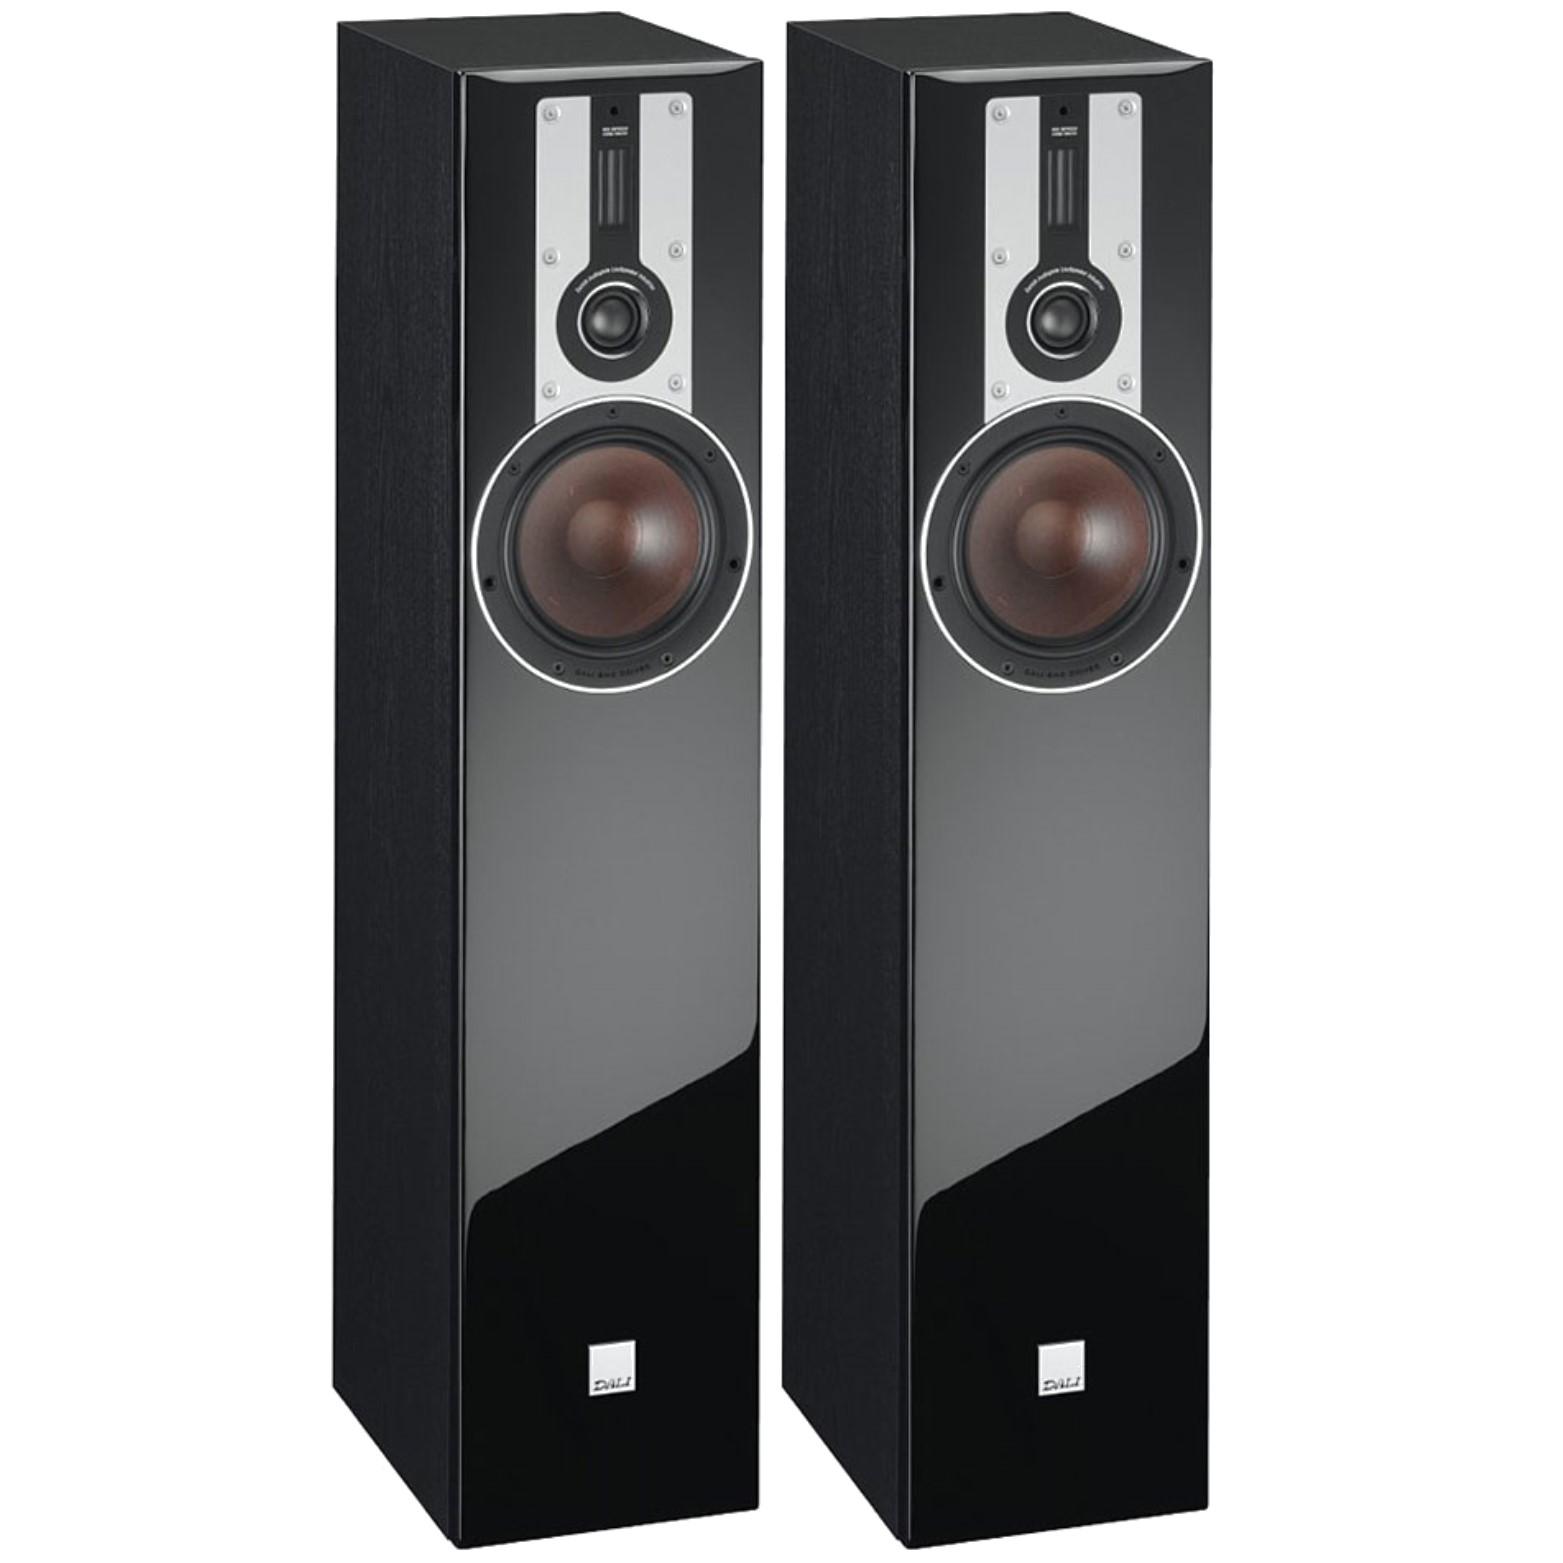 Stylish Speakers dali opticon 5 powerful stylish 2.5-way compact floorstanding